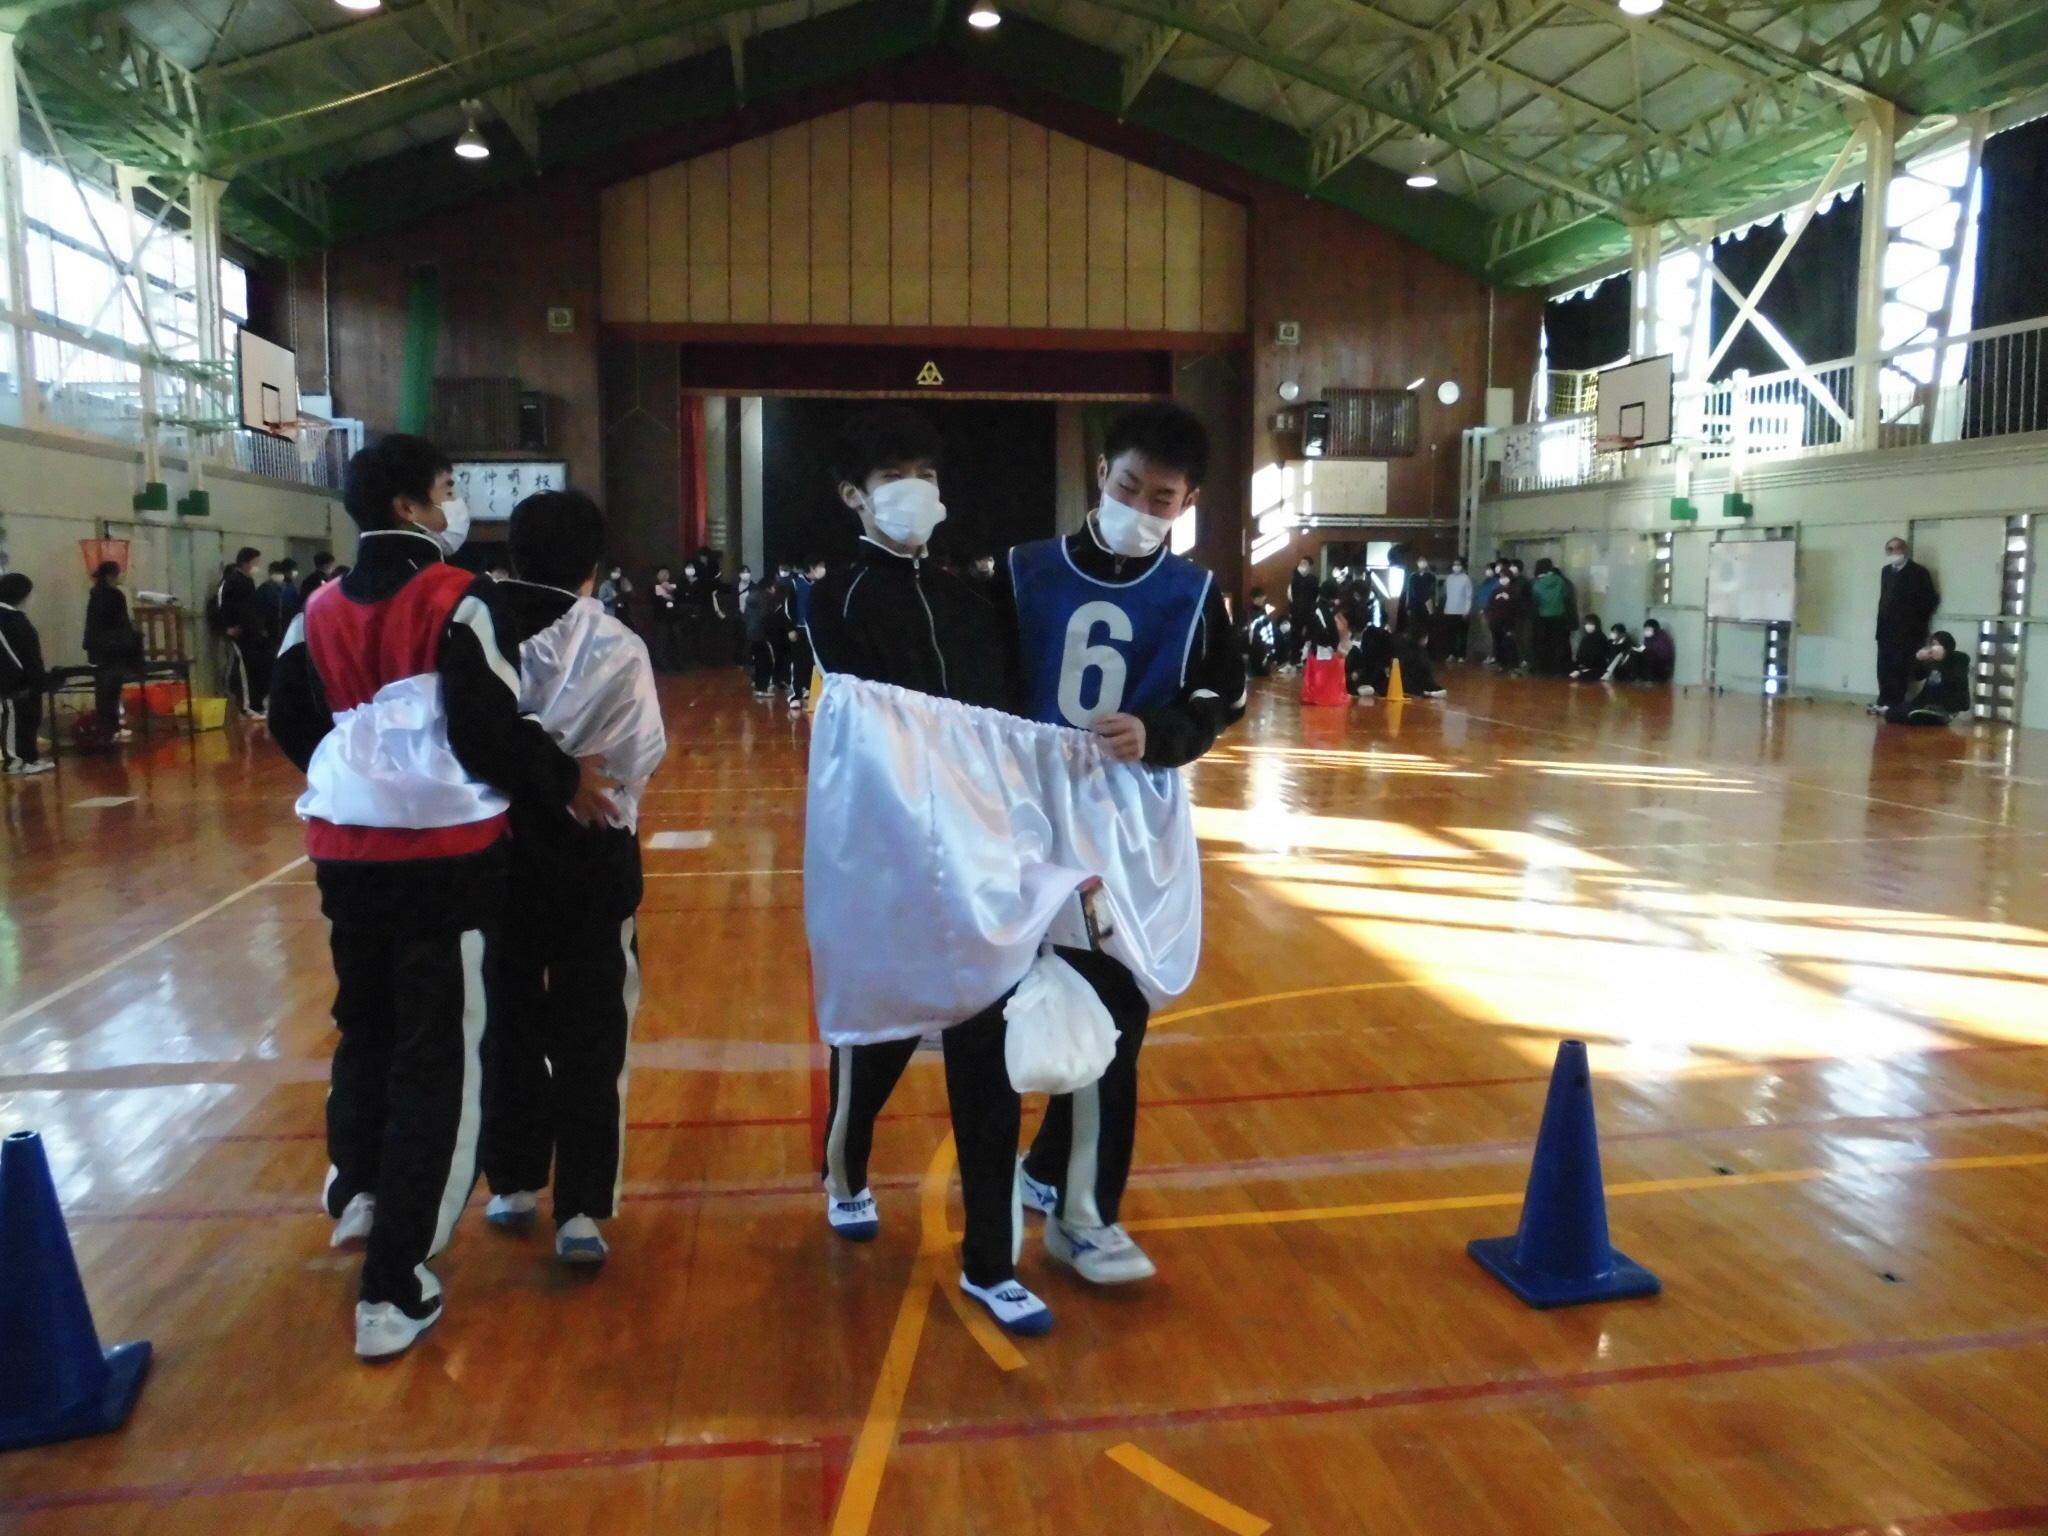 http://www.shimanet.ed.jp/hamadayougo/news/CIMG7662.JPG